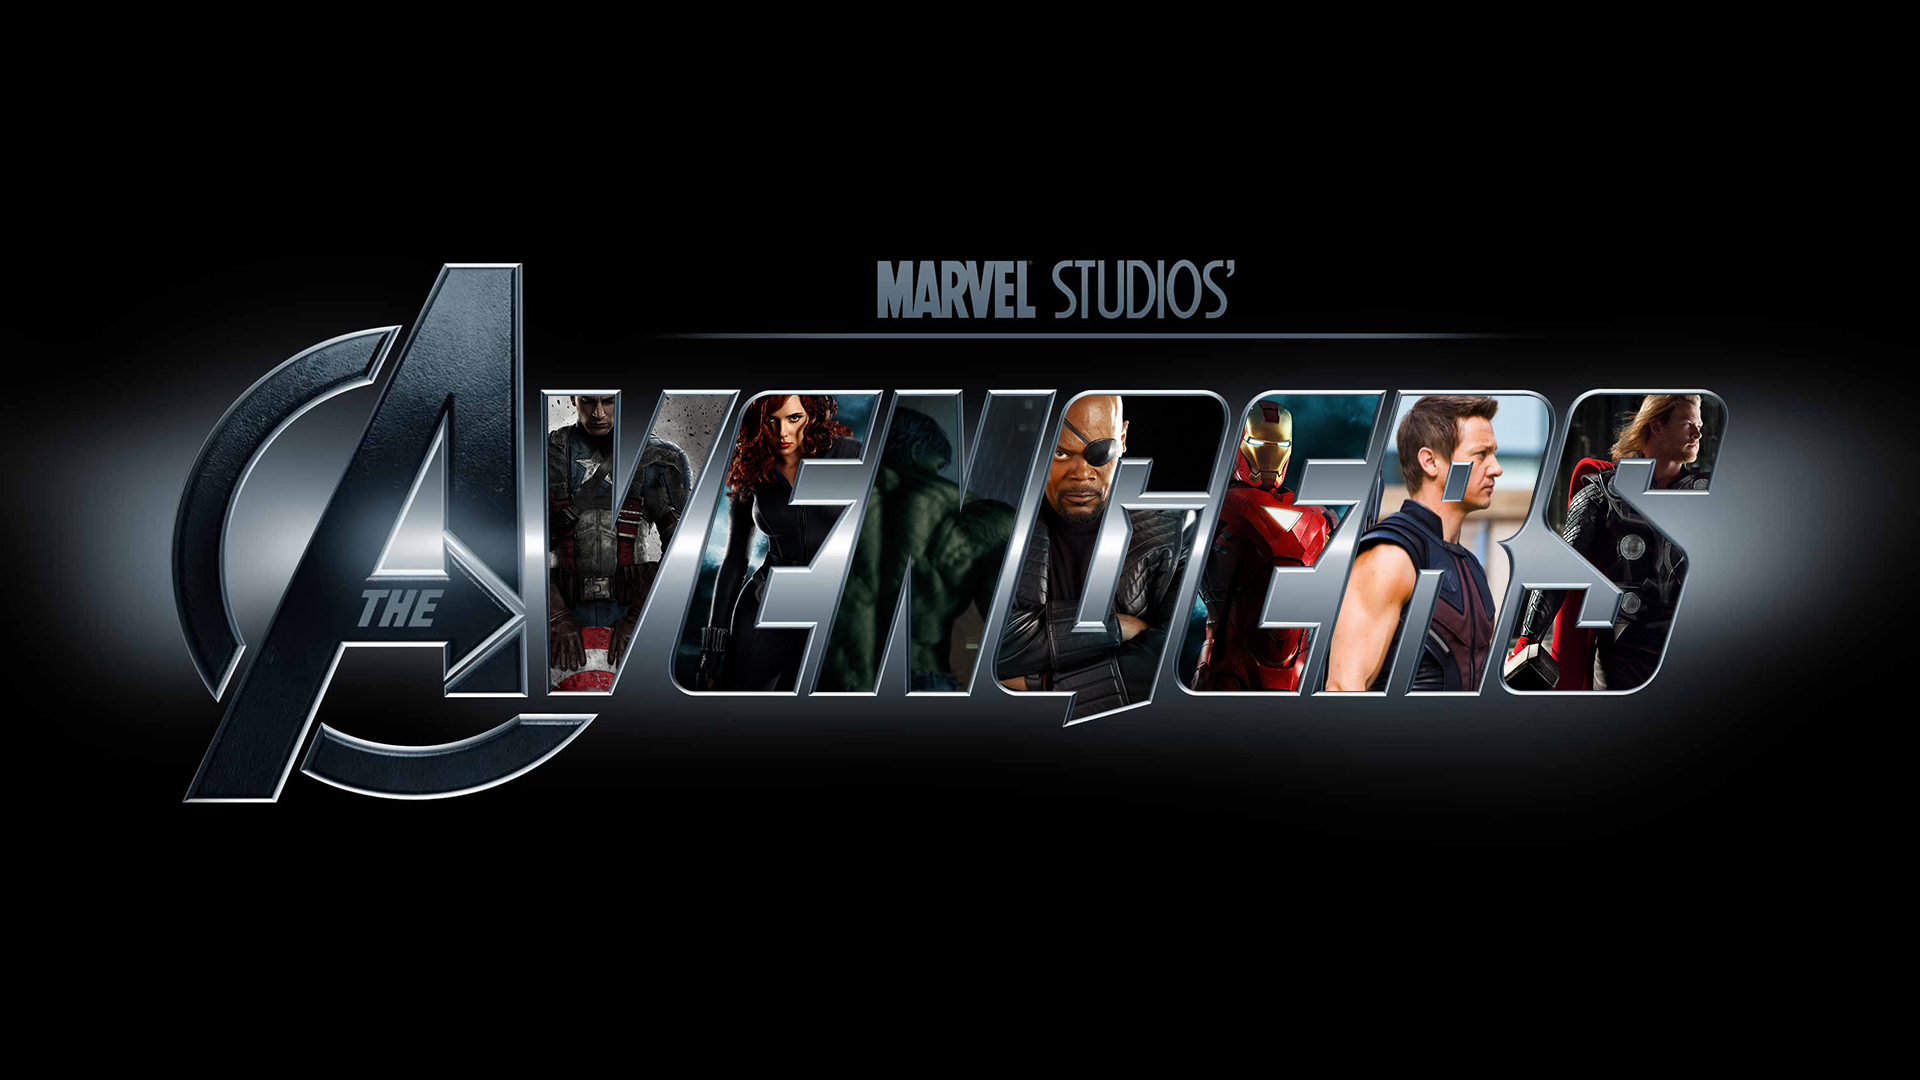 best avengers wallpaper for desktop | wide screen wallpaper 1080p,2k,4k